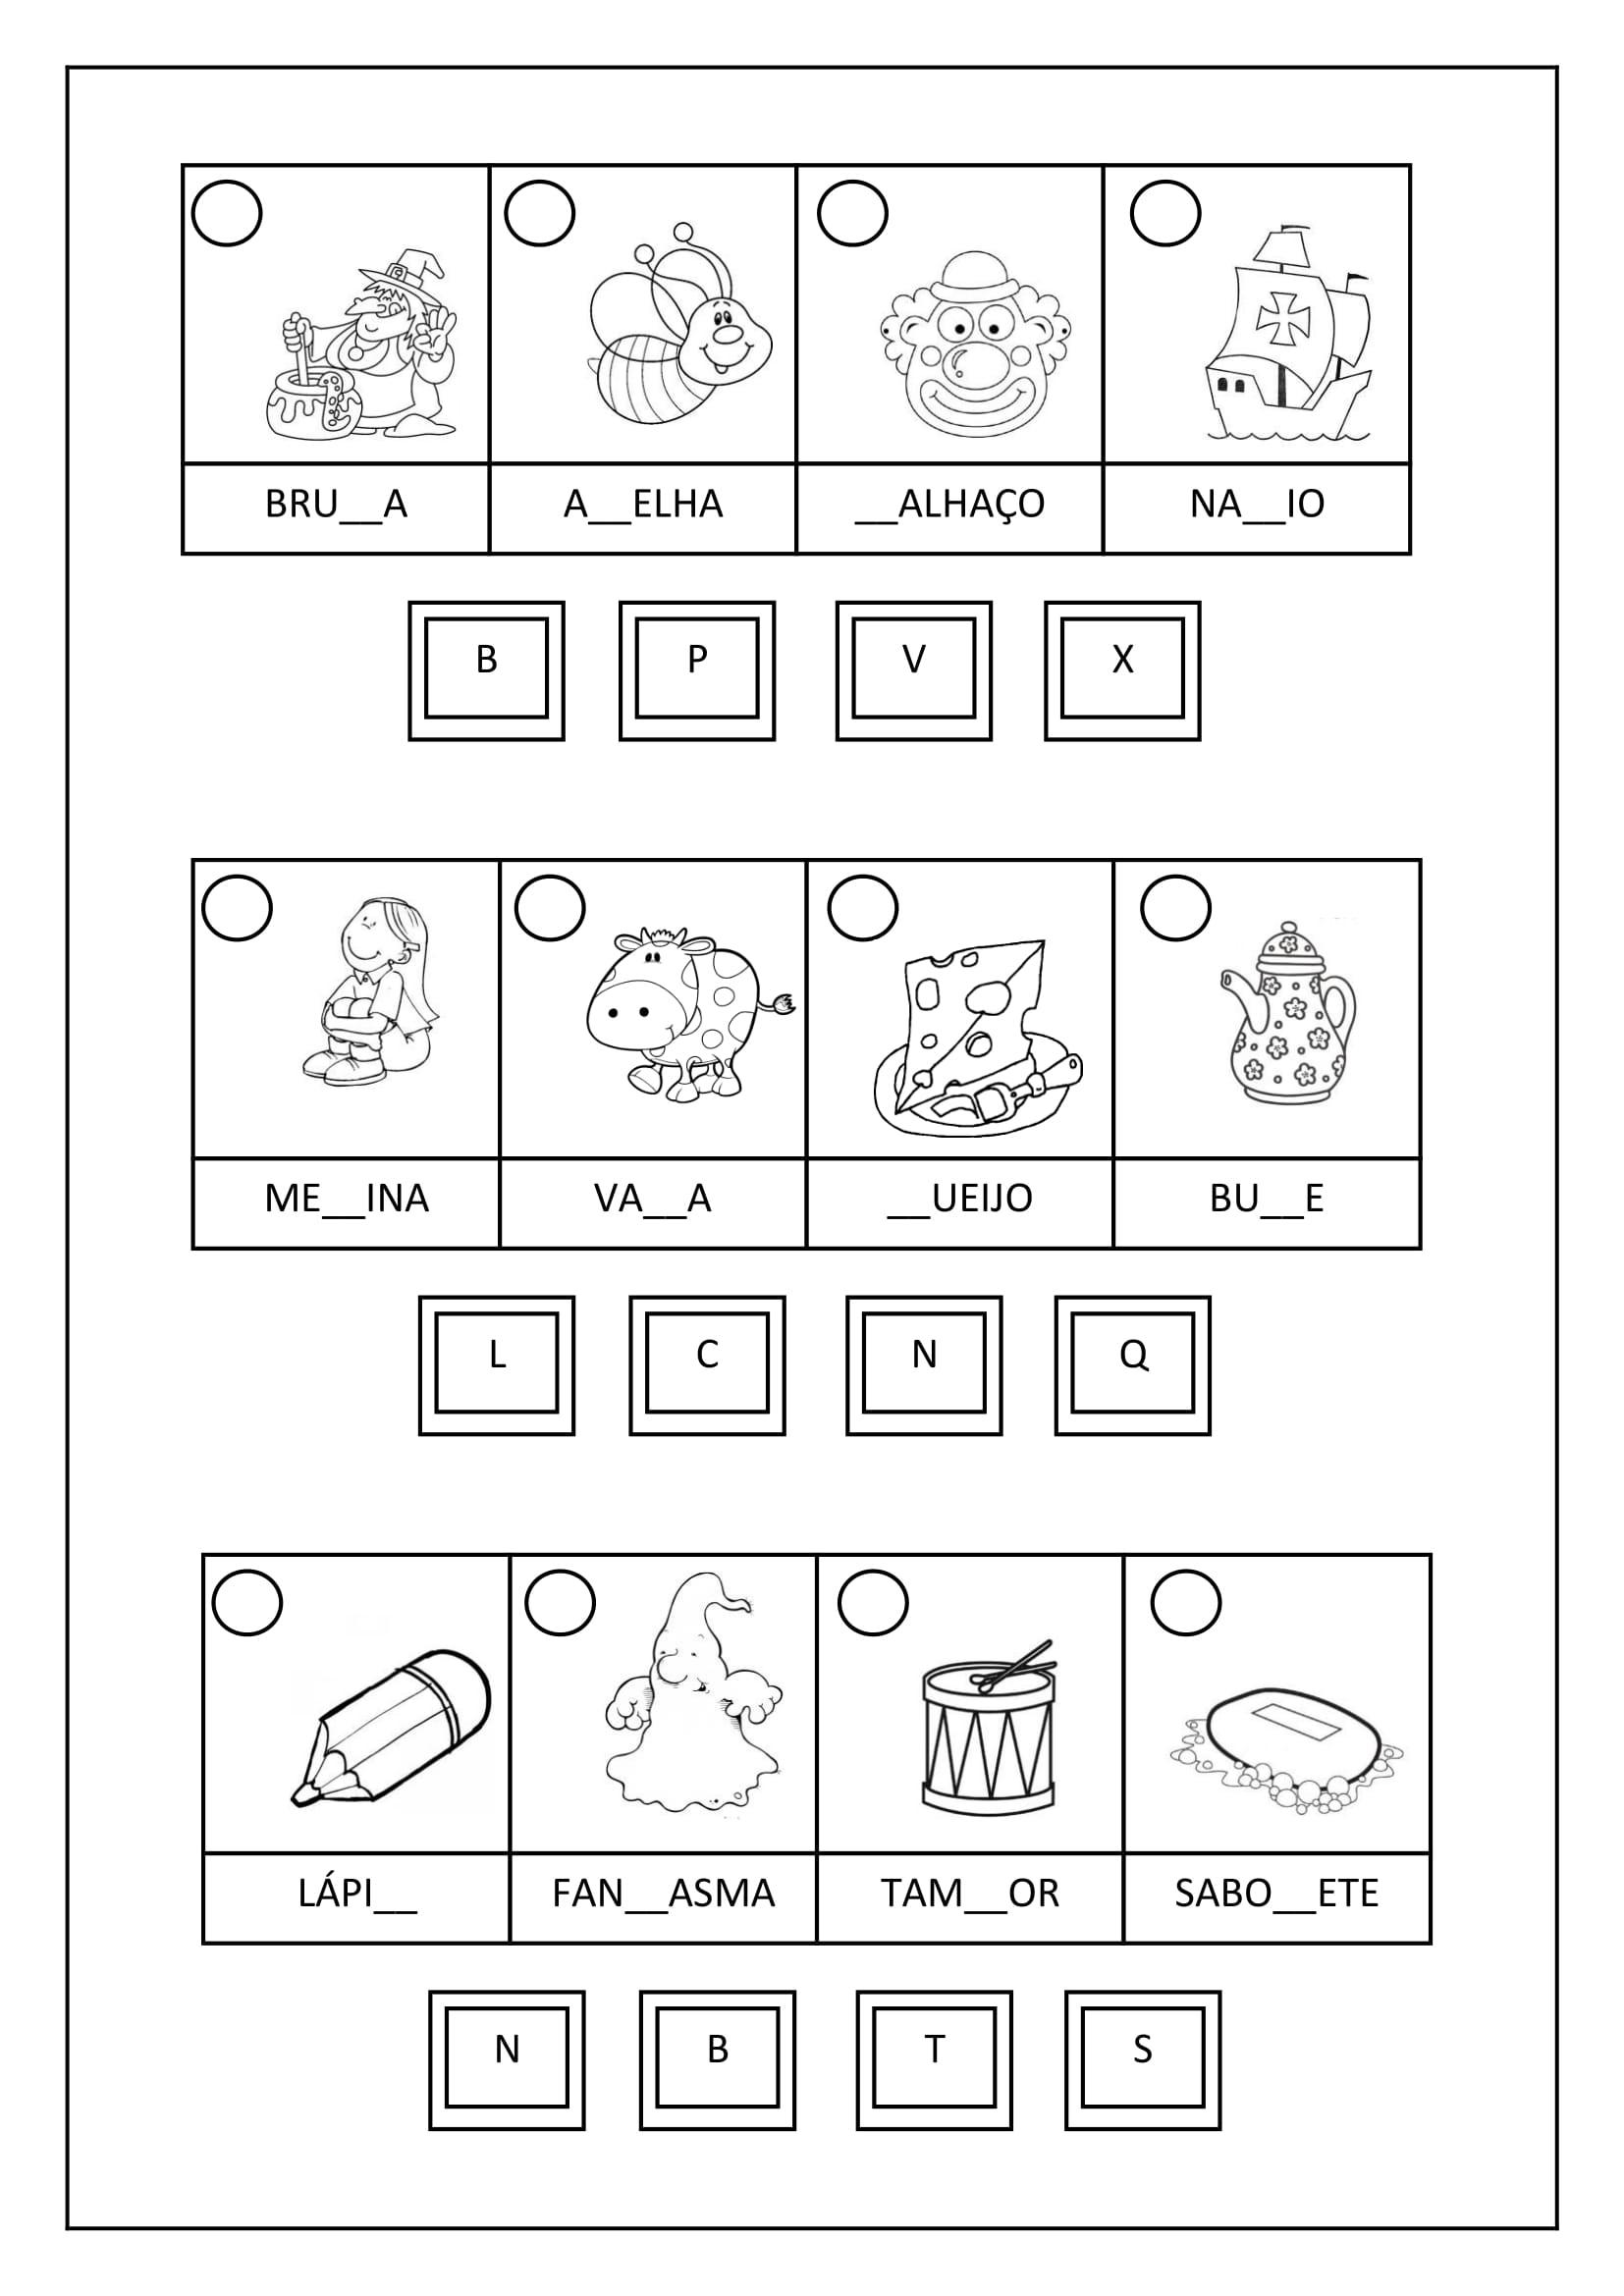 Imprimir_atividades_para_silabicos-10